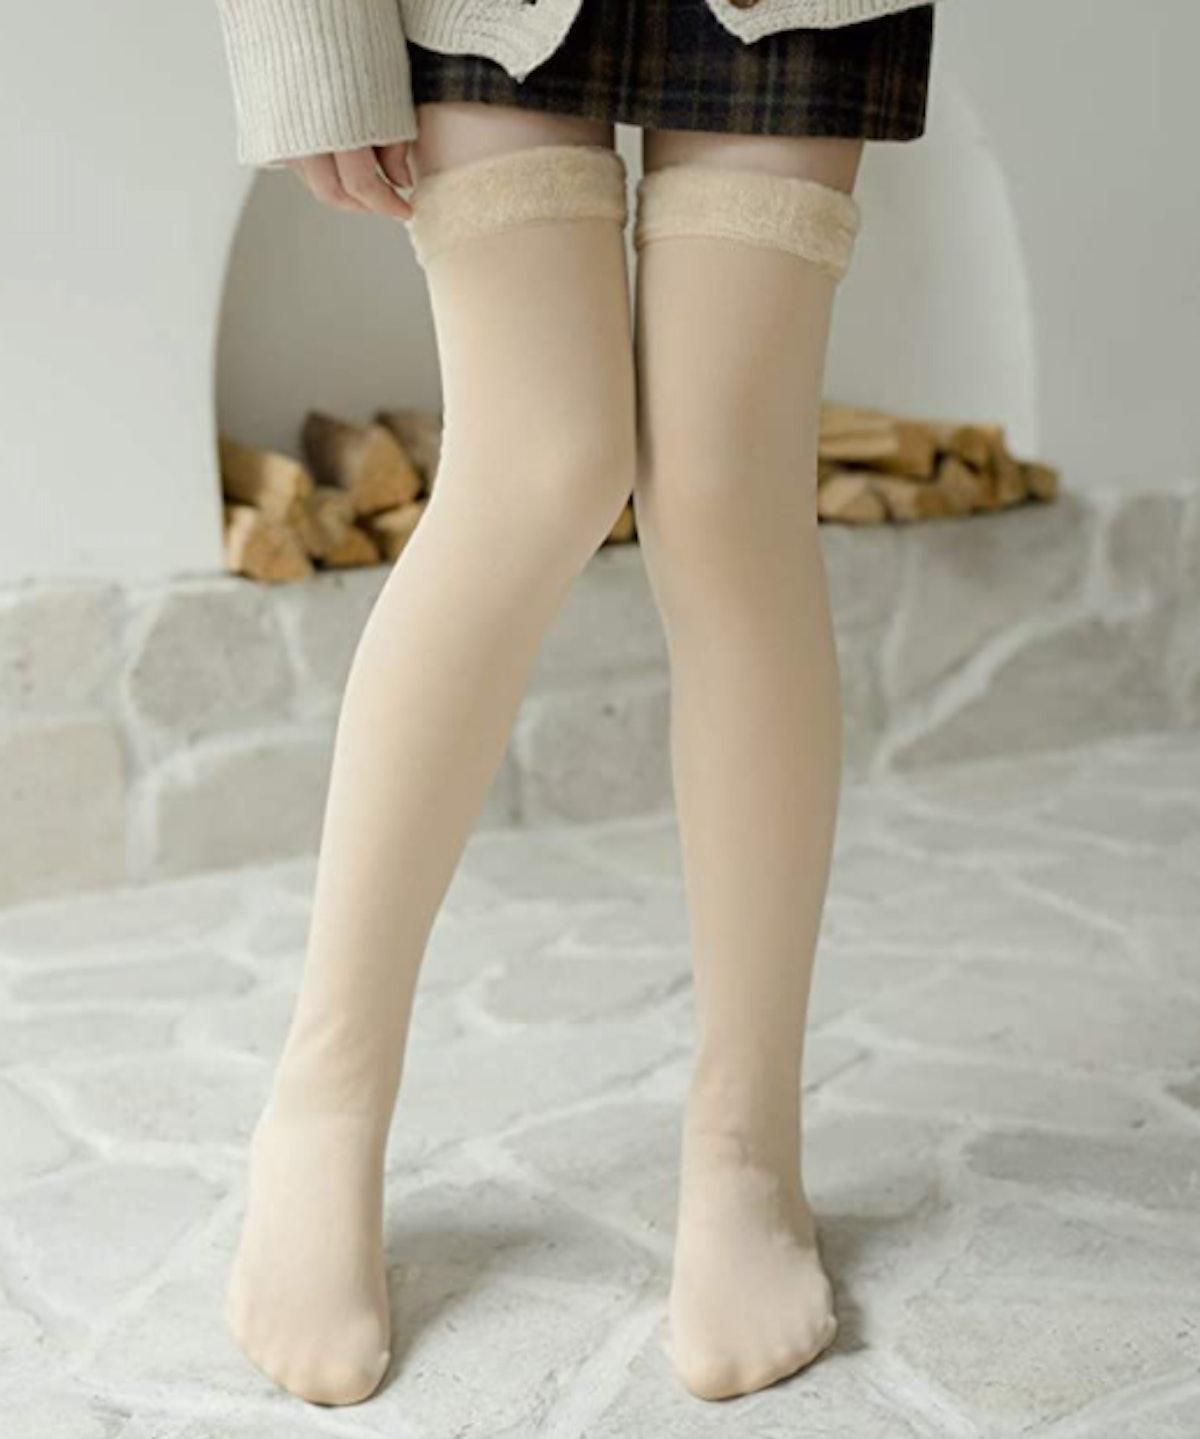 Romastory Over-the-Knee Fleece-Lined Socks